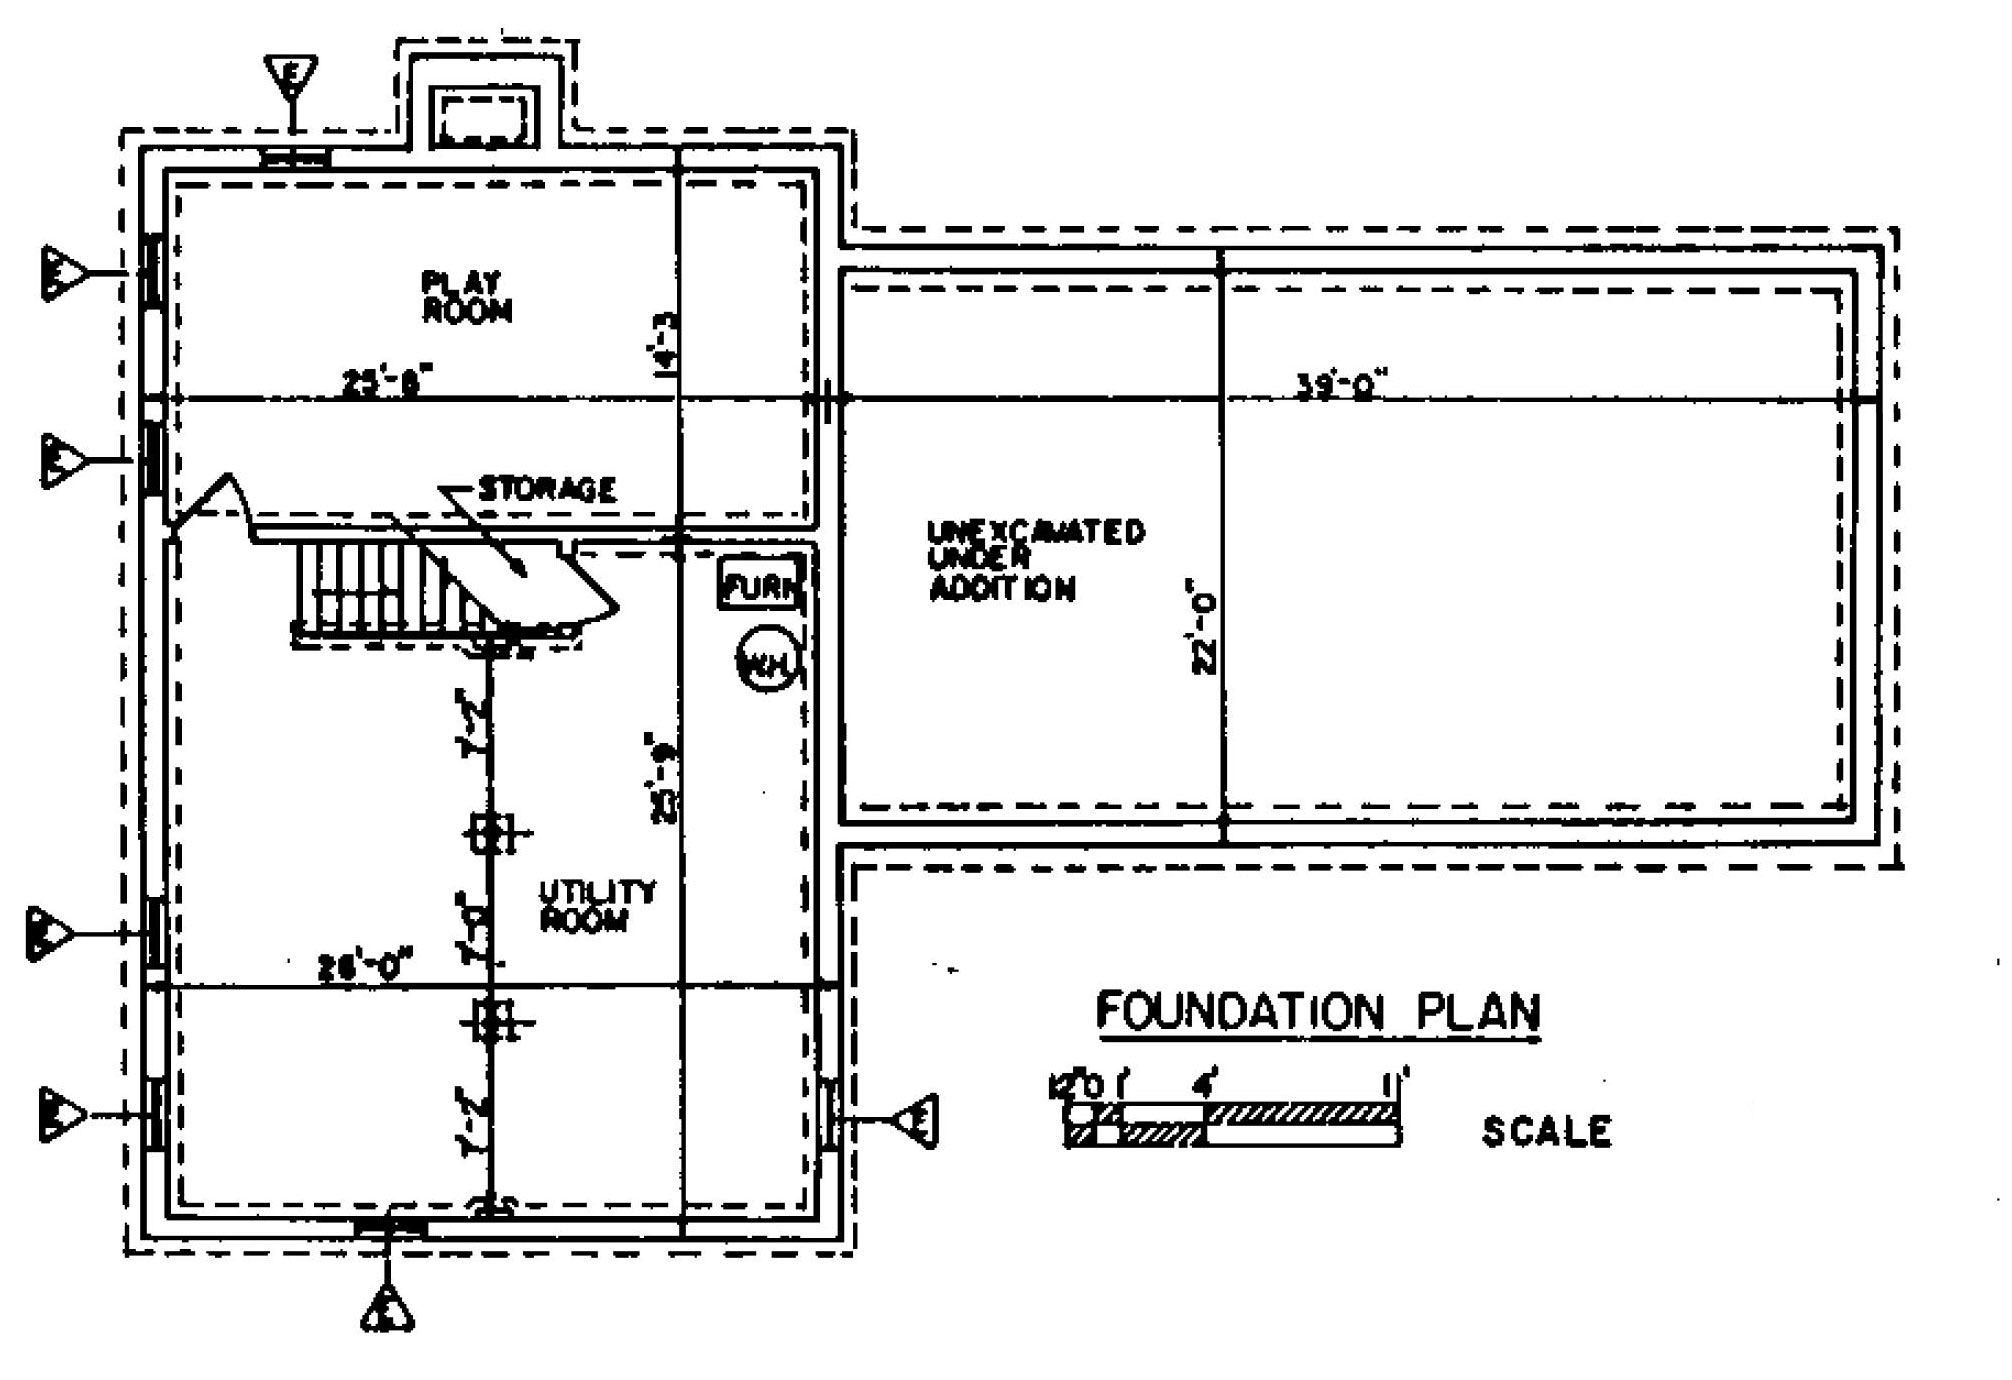 Colonial Basement Foundation O Jpg 2012 1380 Home Design Plans How To Plan Custom Home Plans